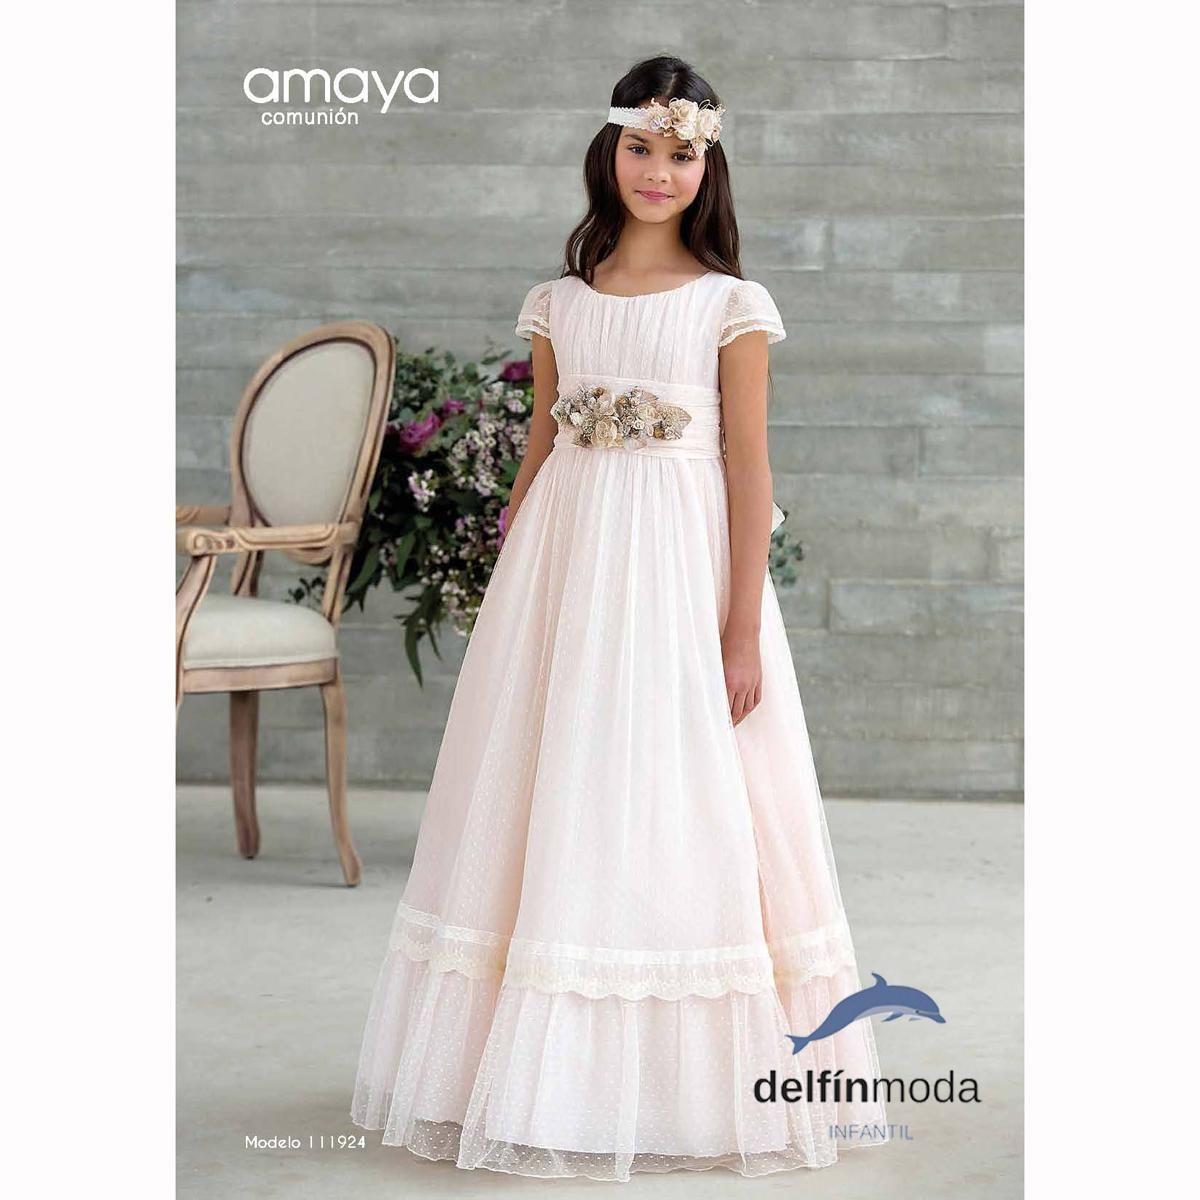 Modelos de vestidos para comunion 2018